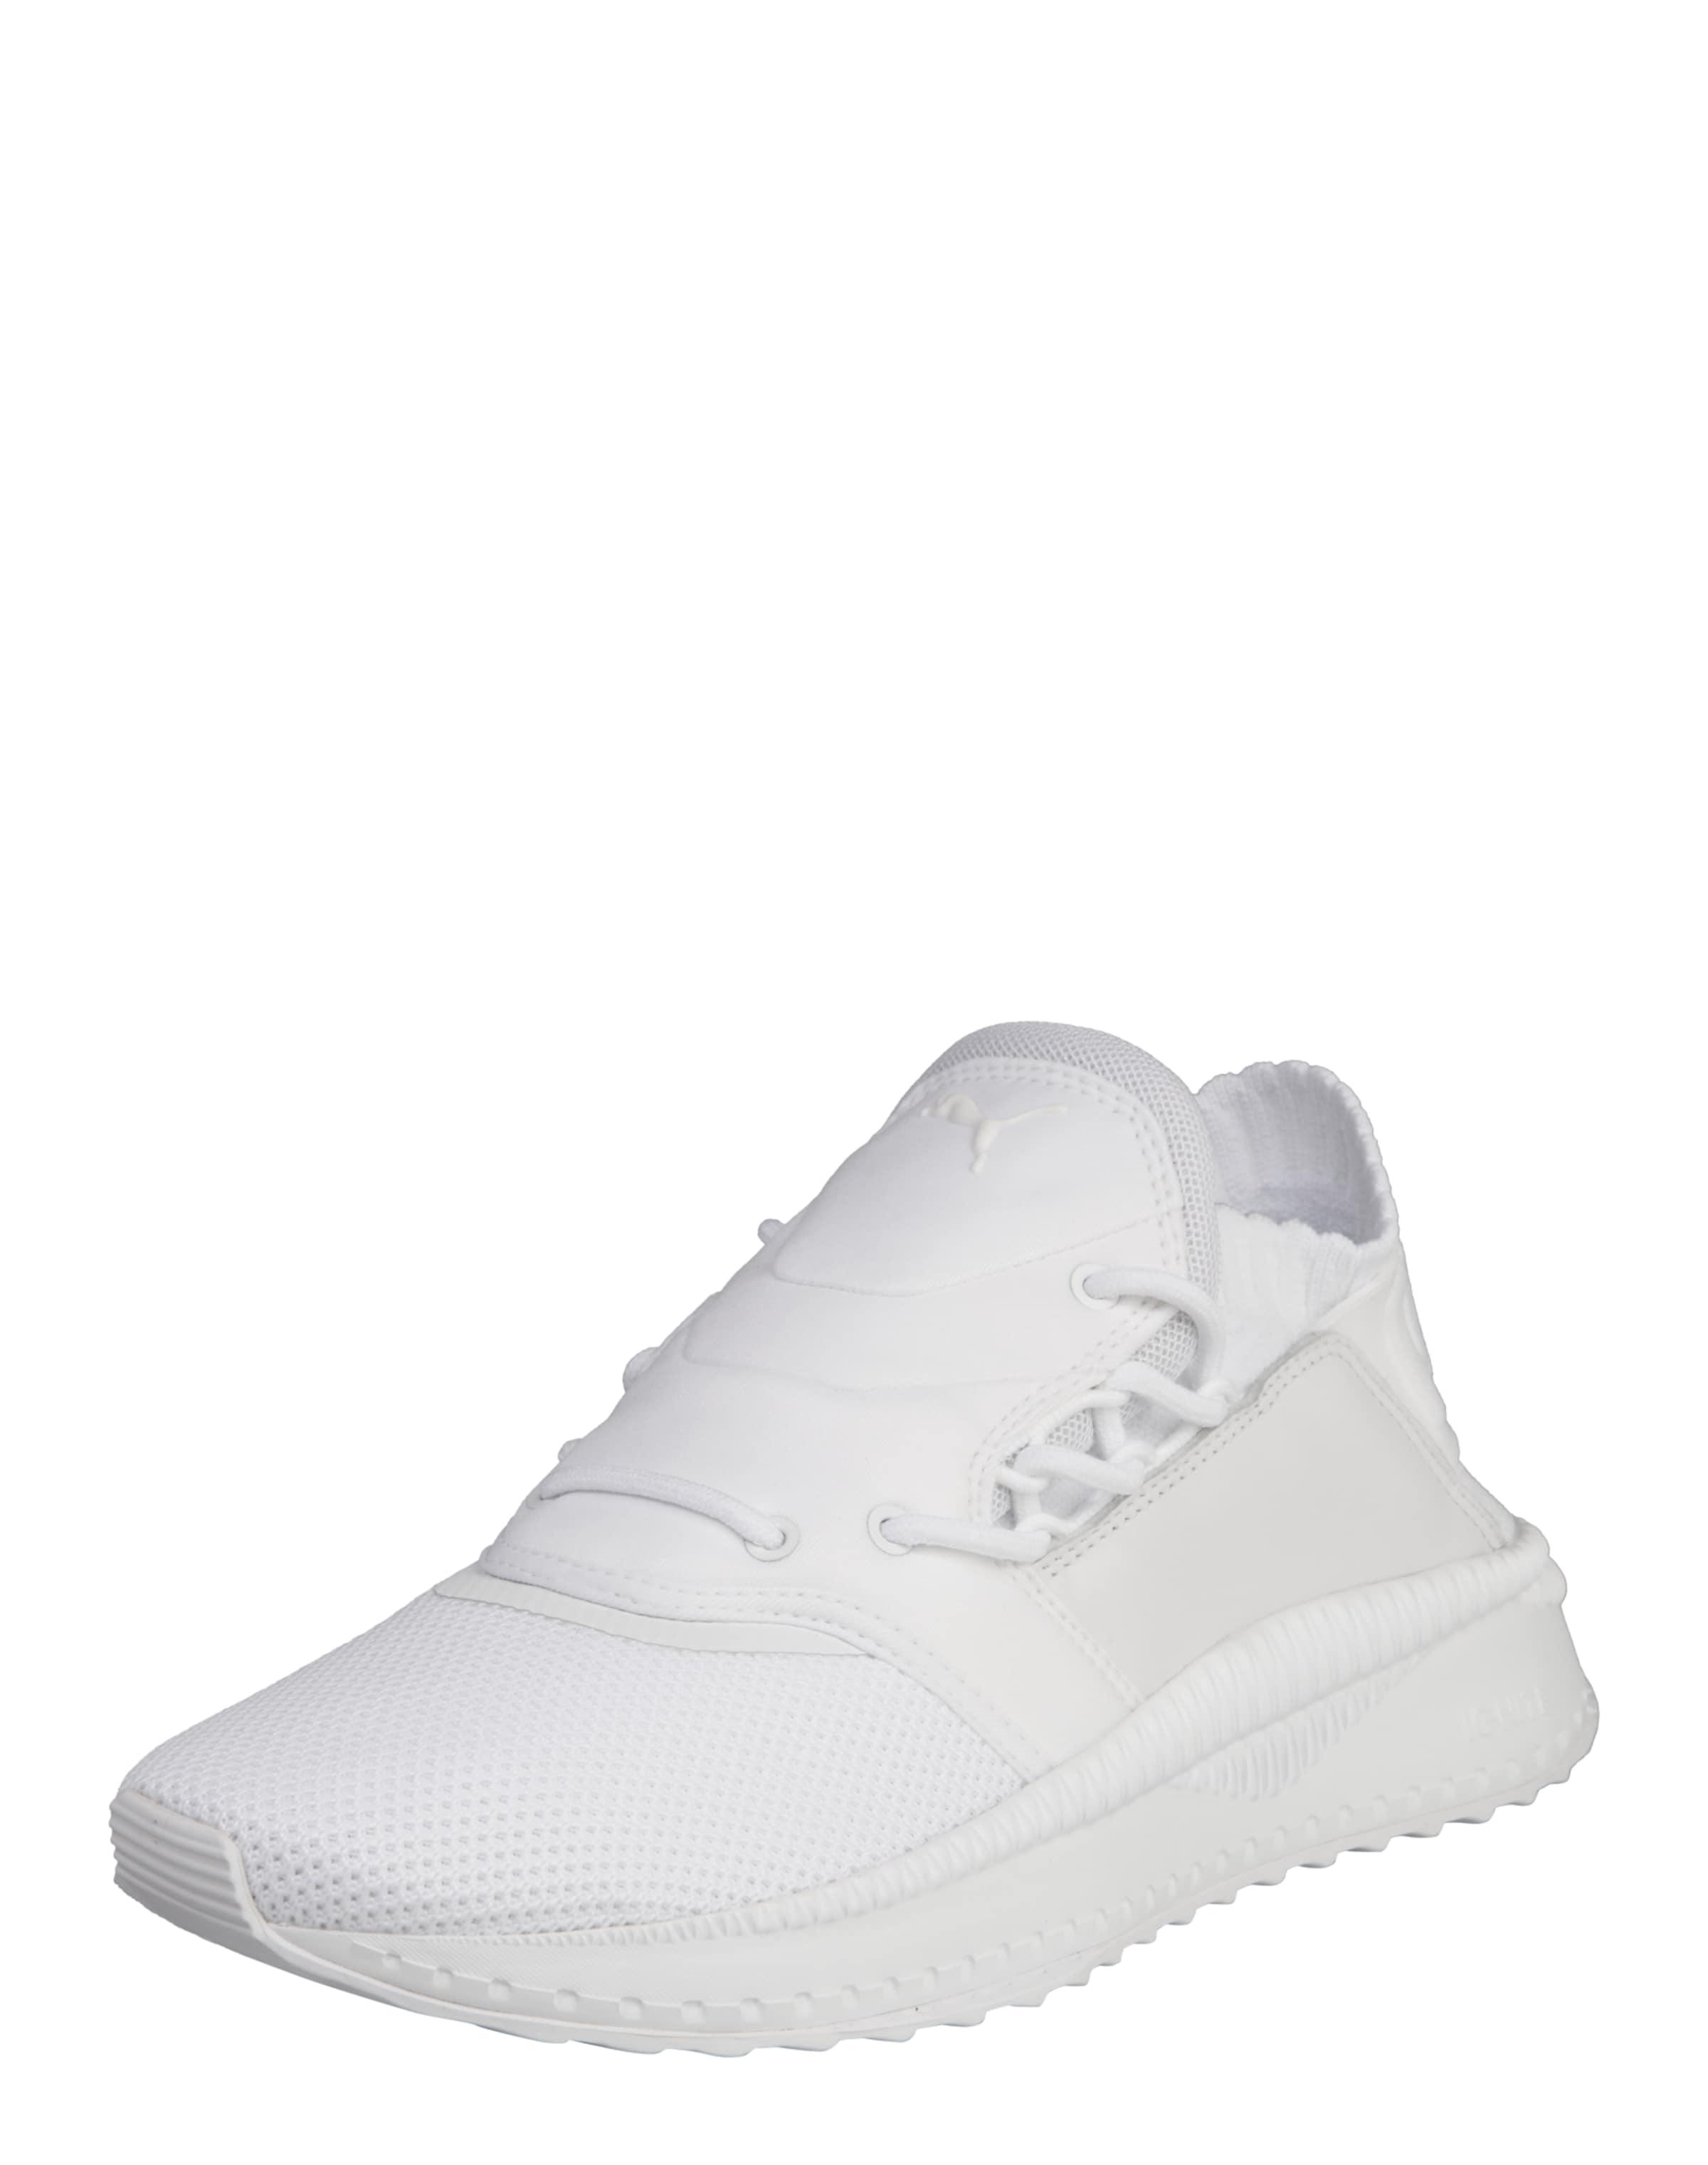 PUMA Sneaker 'Tsugi Shinsei' Spielraum Großer Rabatt HWmAdn